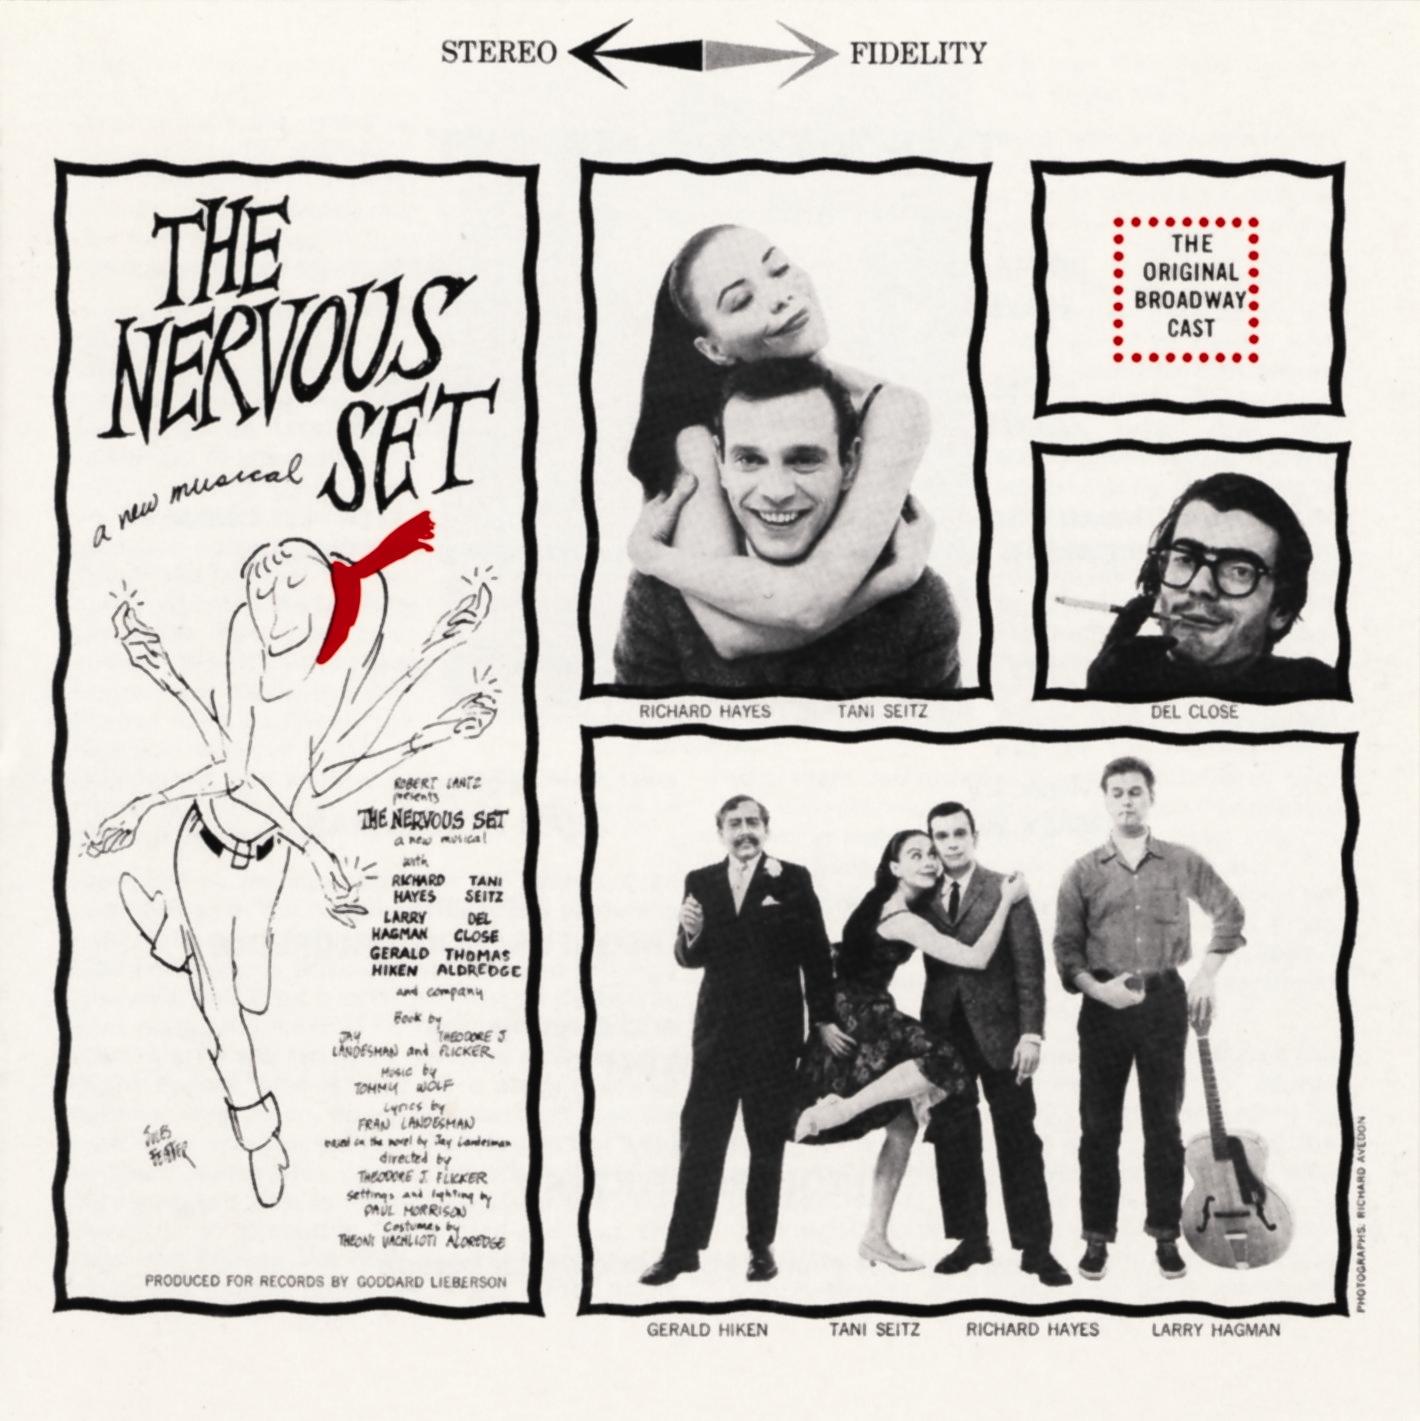 The Nervous Set – Original Broadway Cast 1959